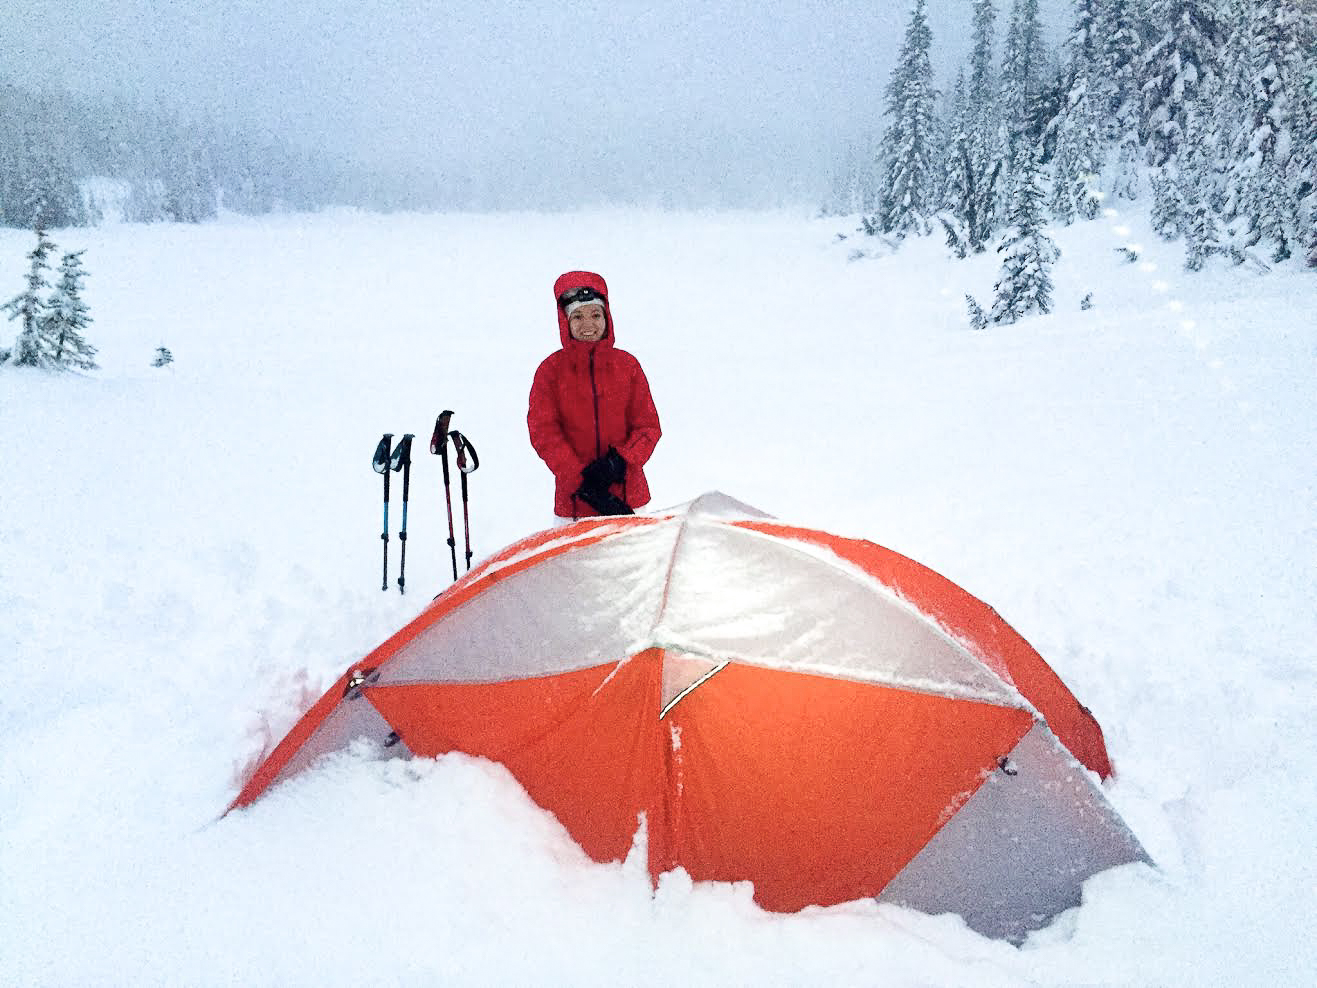 the national parks girl_mountain hardware_long exposure_canon6d_mt rainier_washington_winter camping_tangent 2 tent.JPG